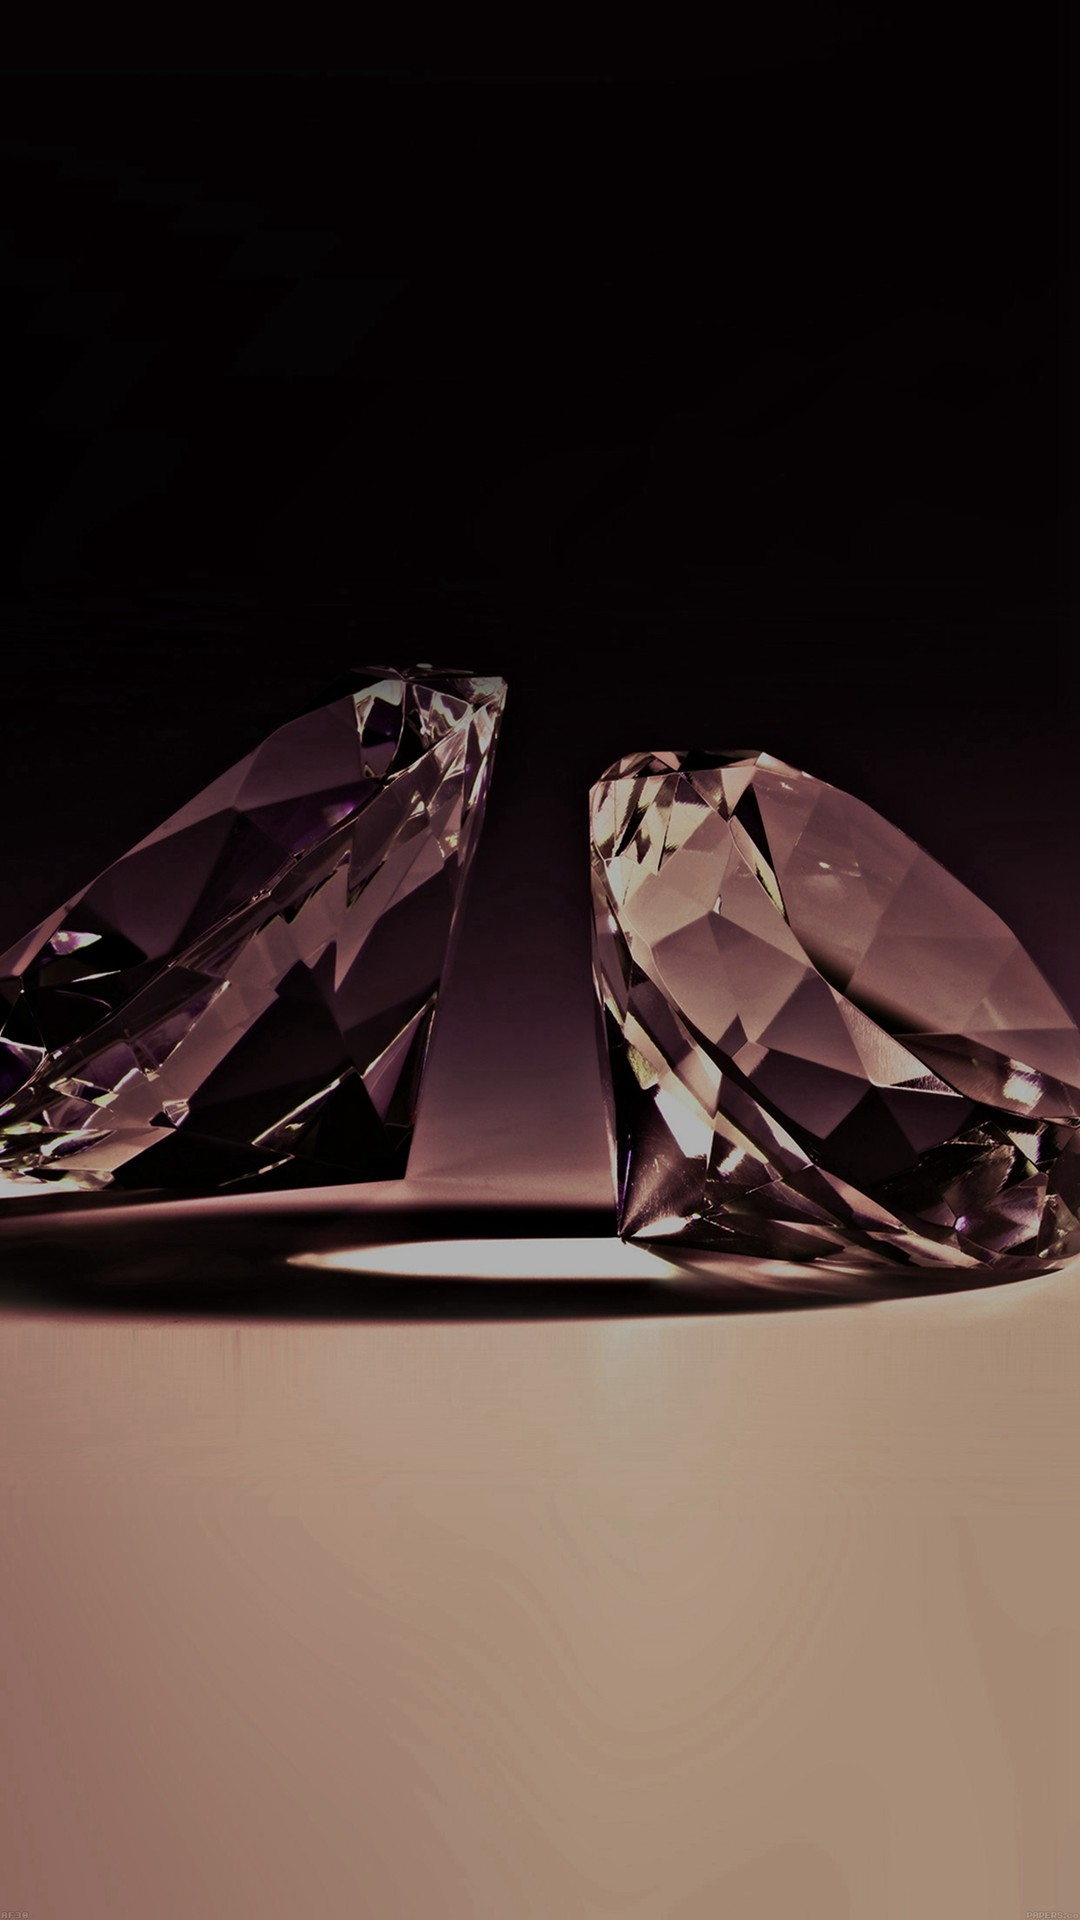 Res: 1080x1920, Black Diamond